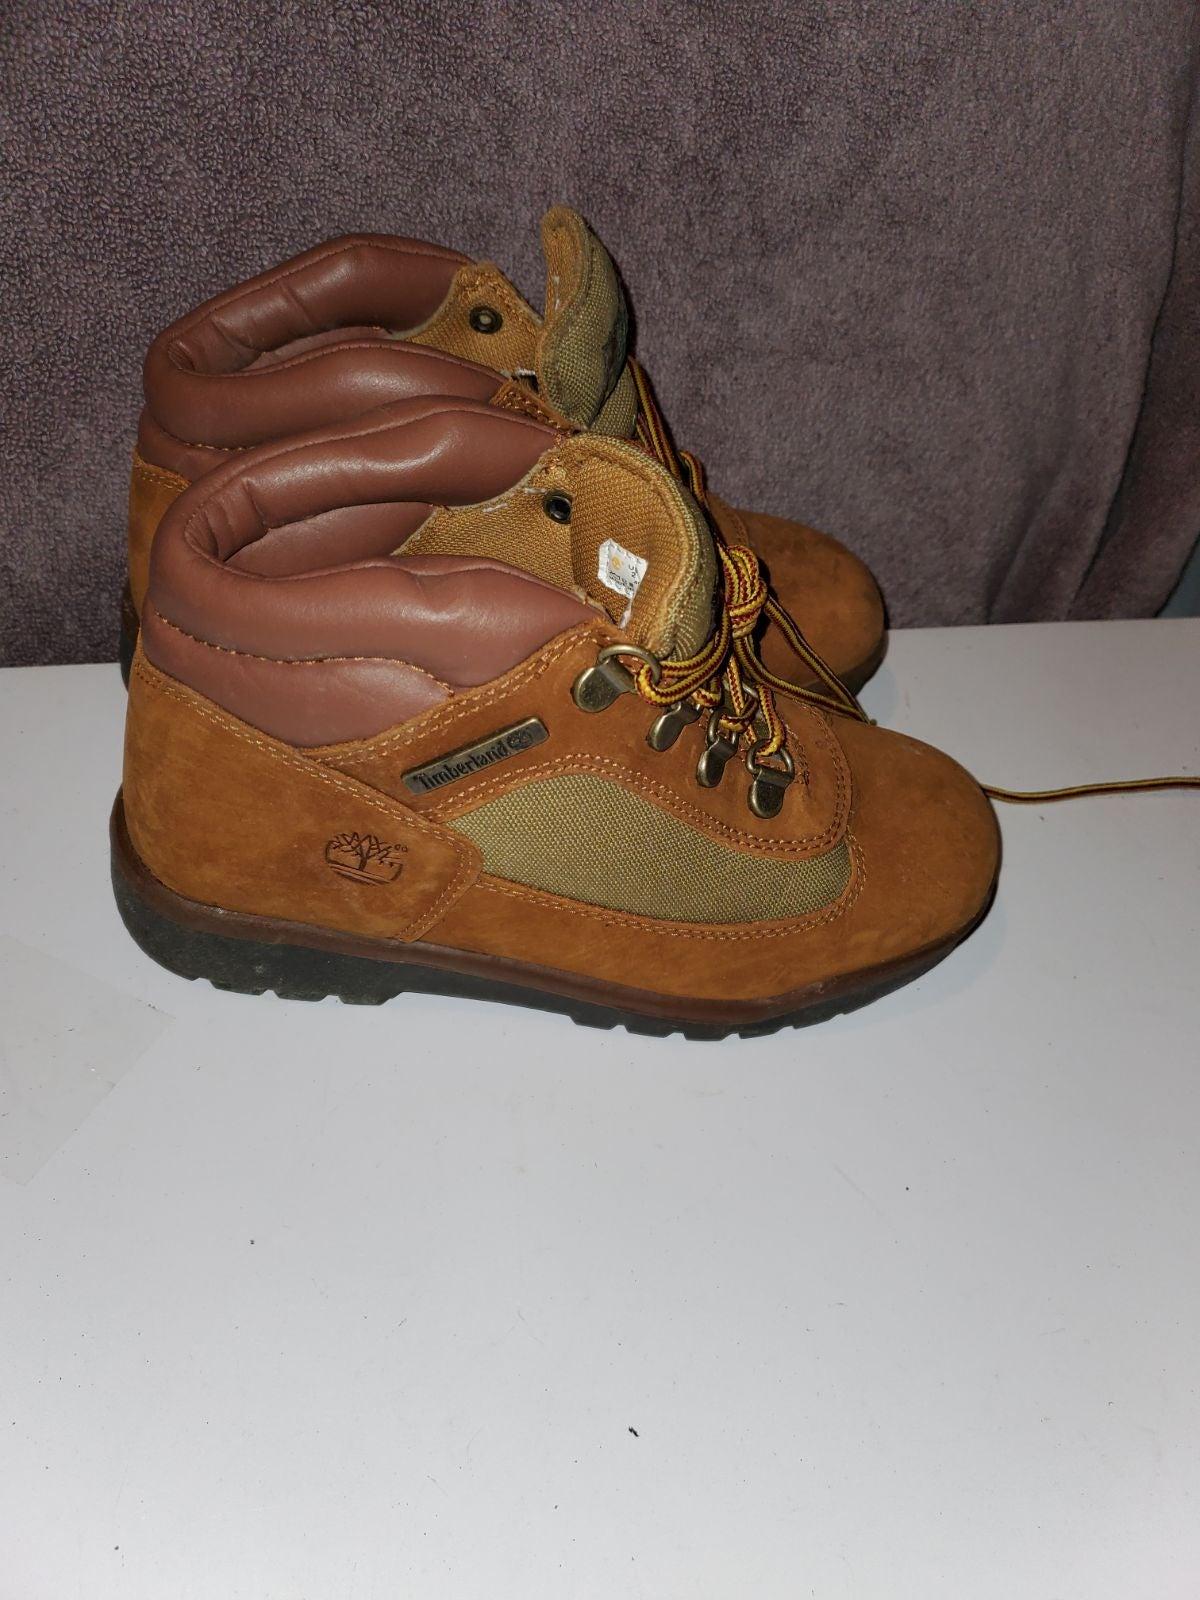 Timberland Boots, size 2